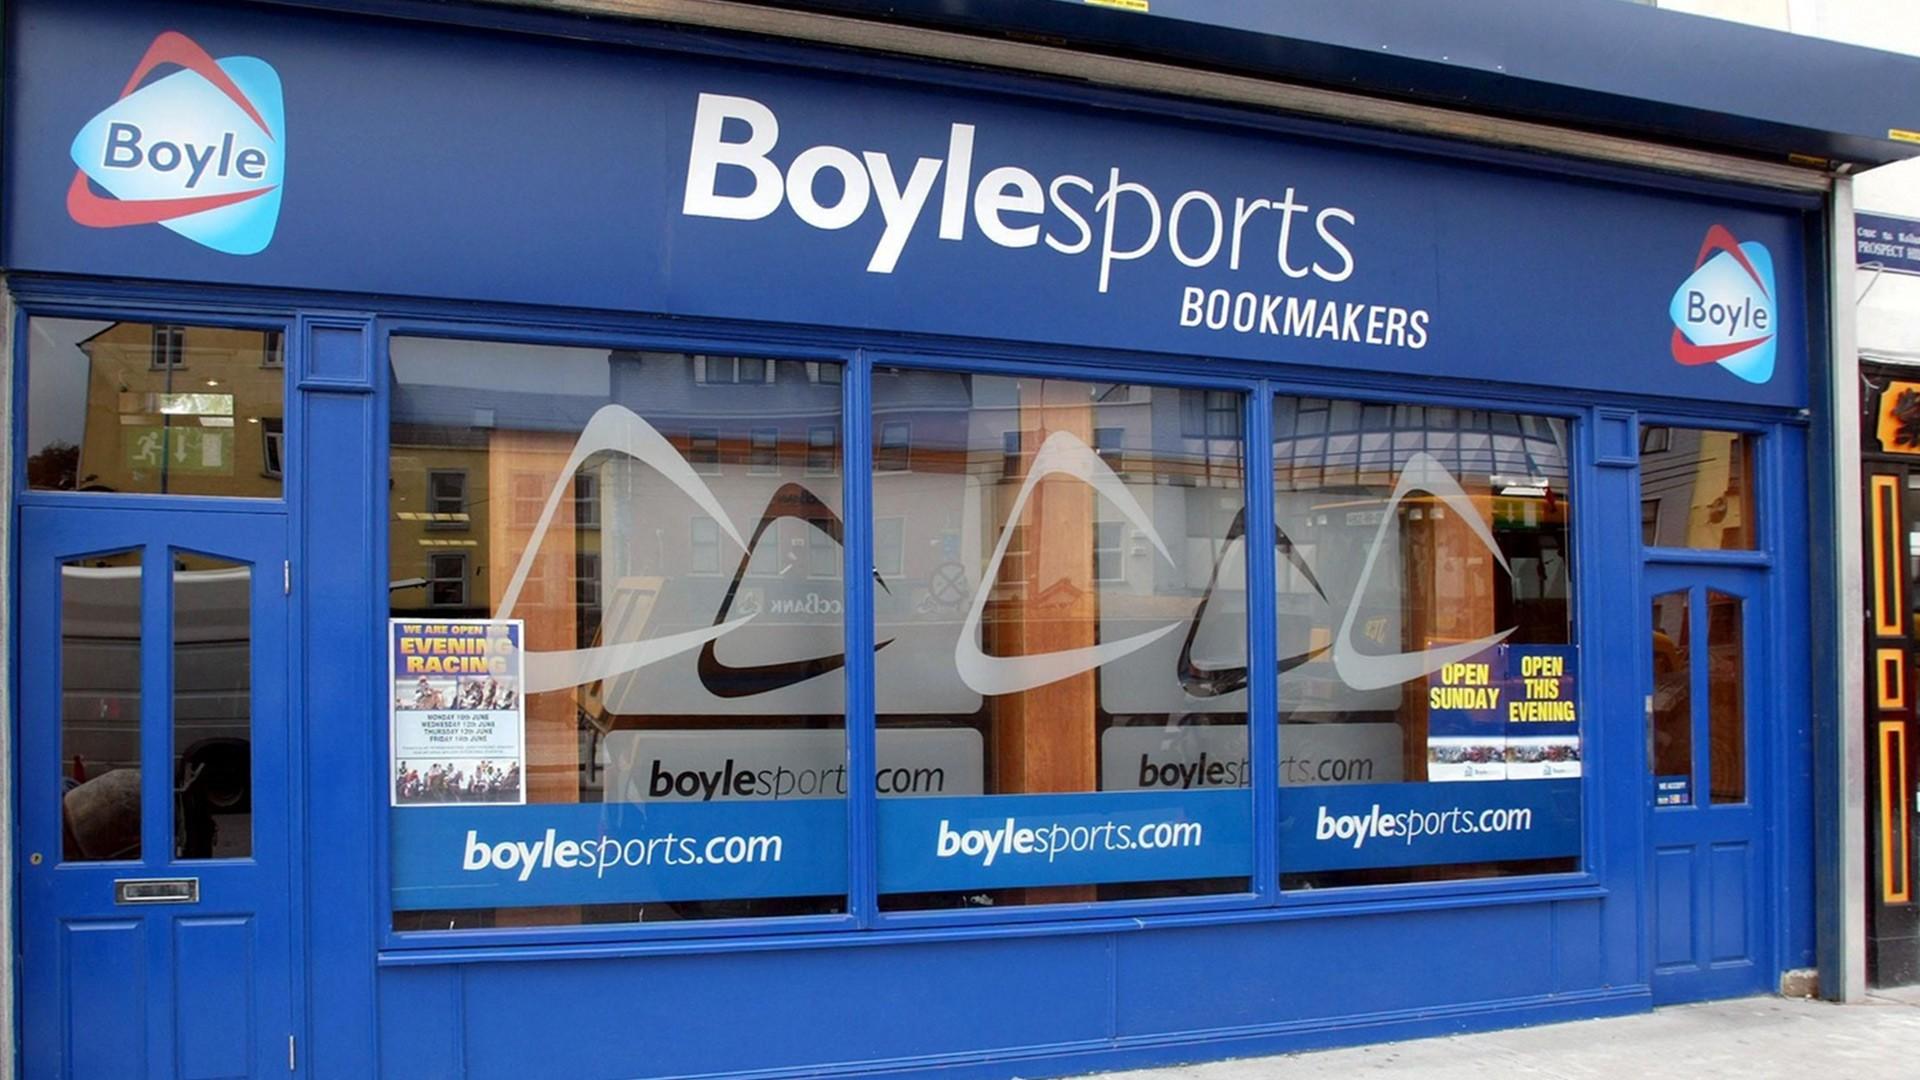 BoyleSports enters UK market - The Gambling Times